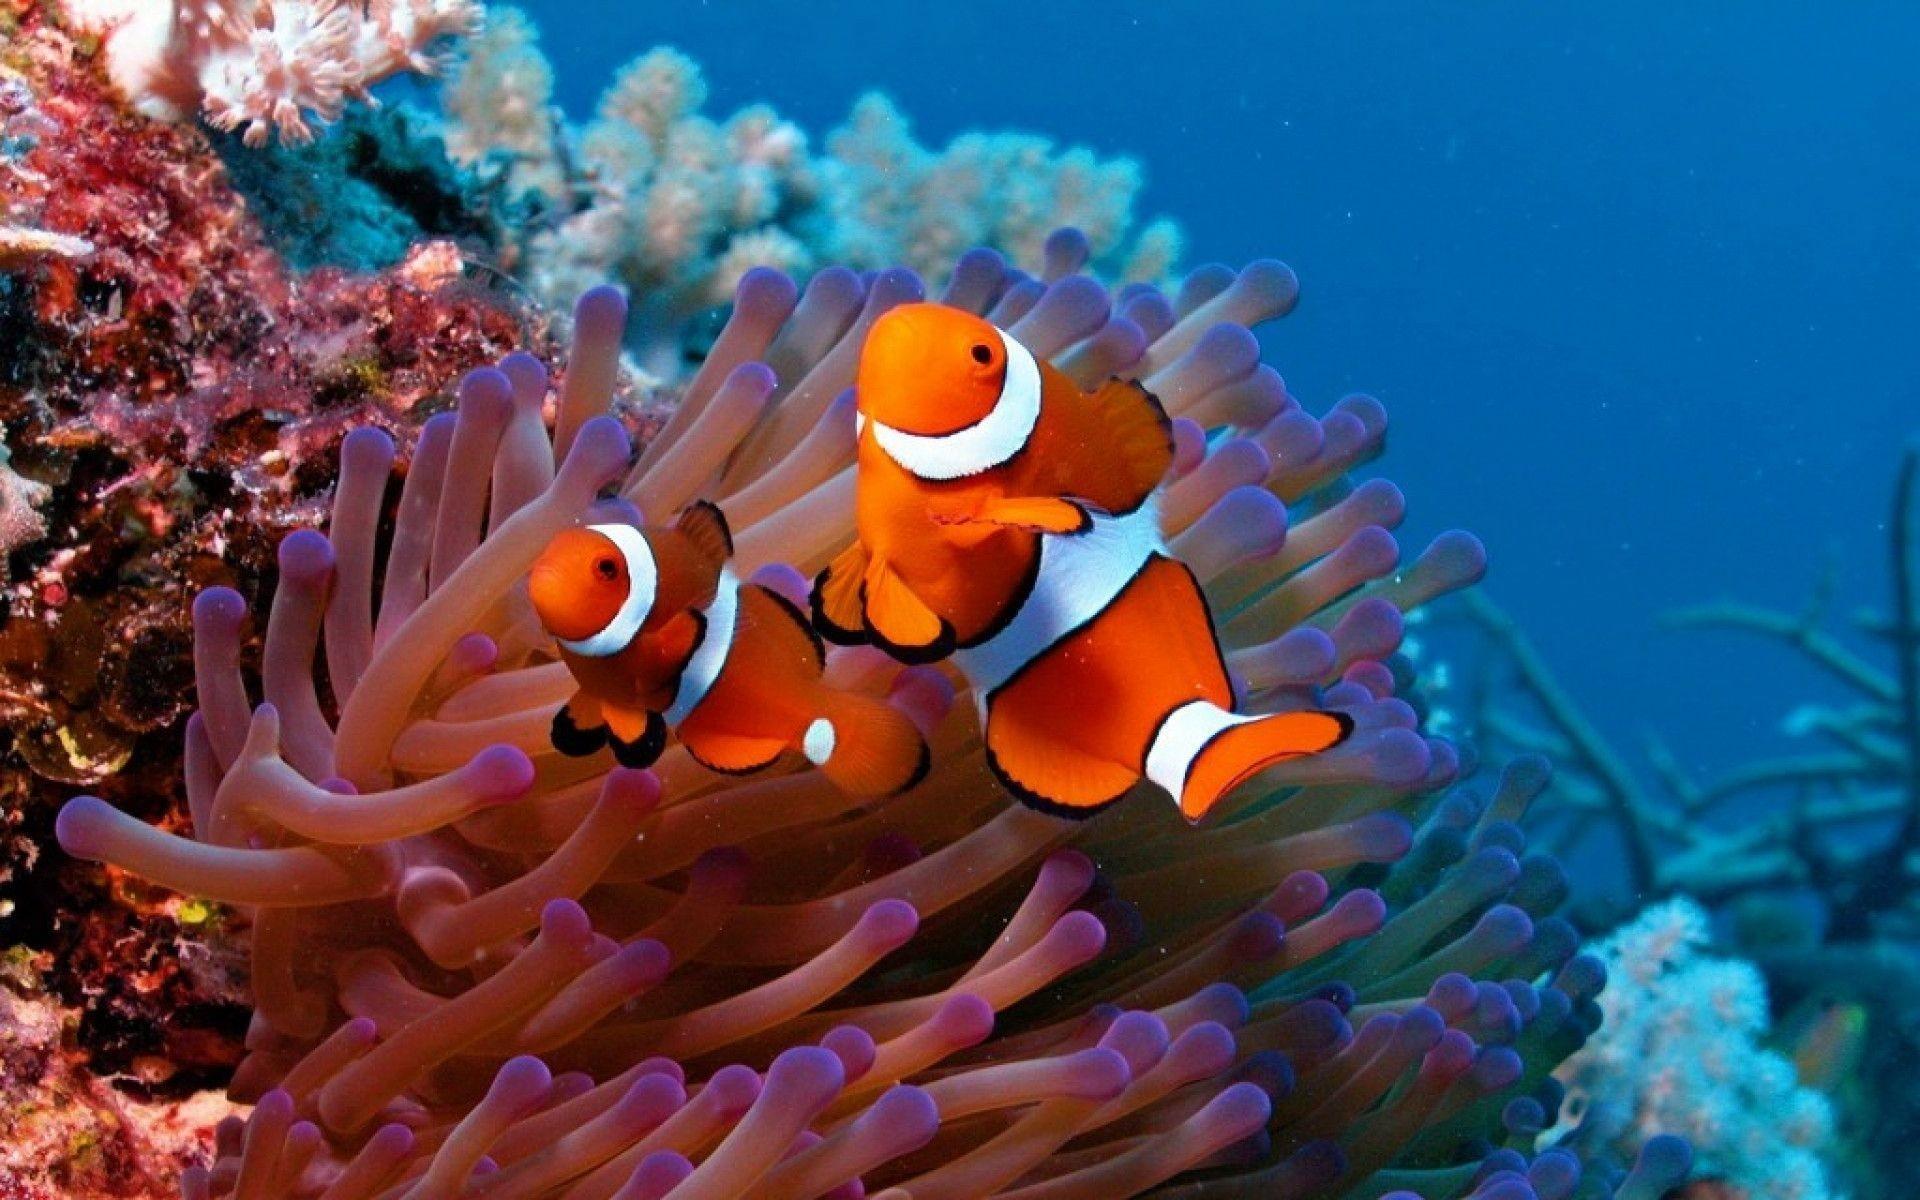 Fish Wallpaper and Screensavers (58+ images)